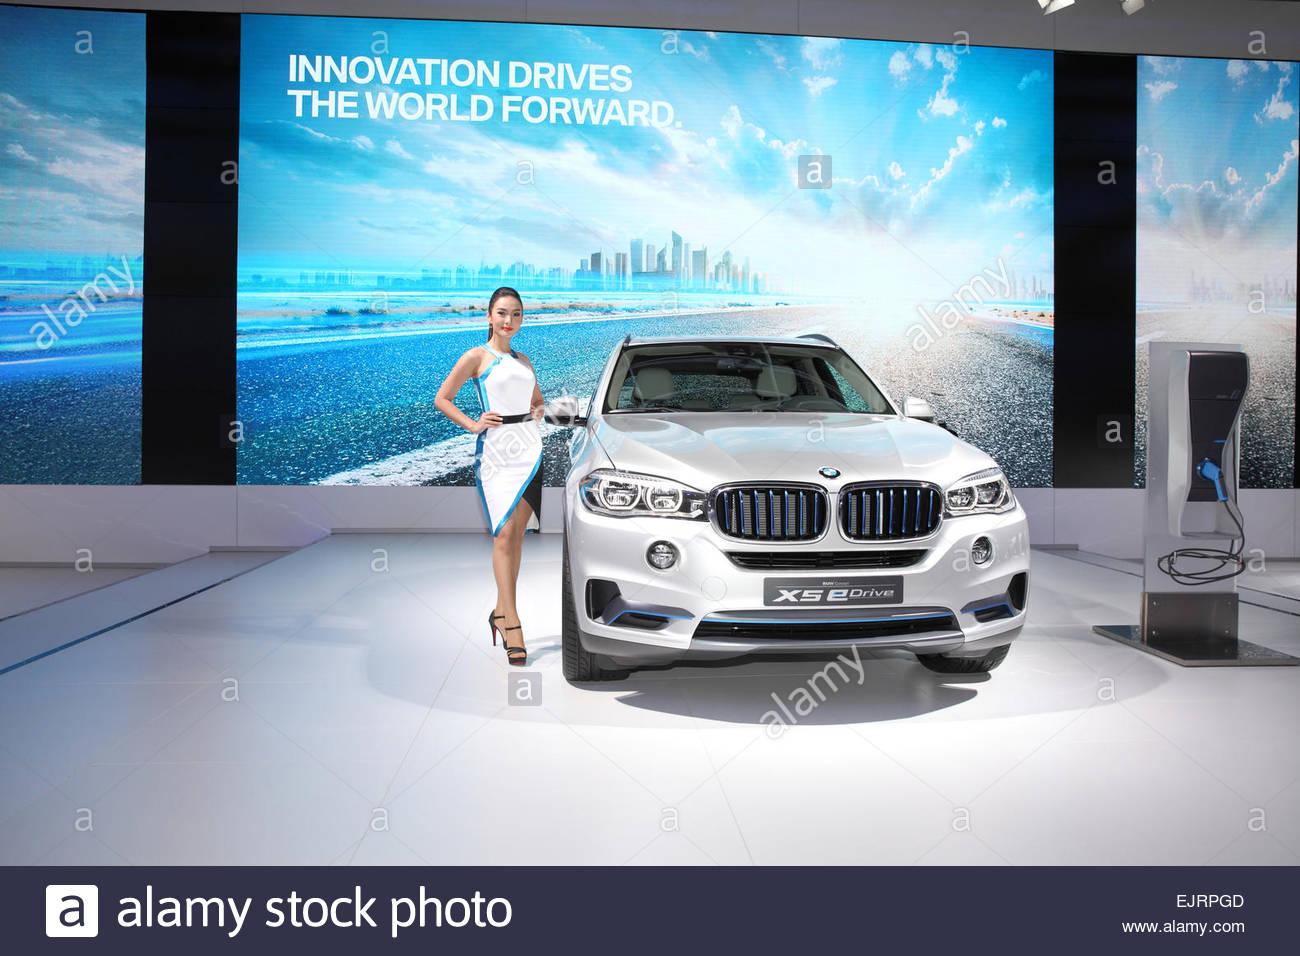 BANGKOK - MARCH 24: BMW X5 edrive car with Unidentified model  on display at The 36 th Bangkok International Motor - Stock Image